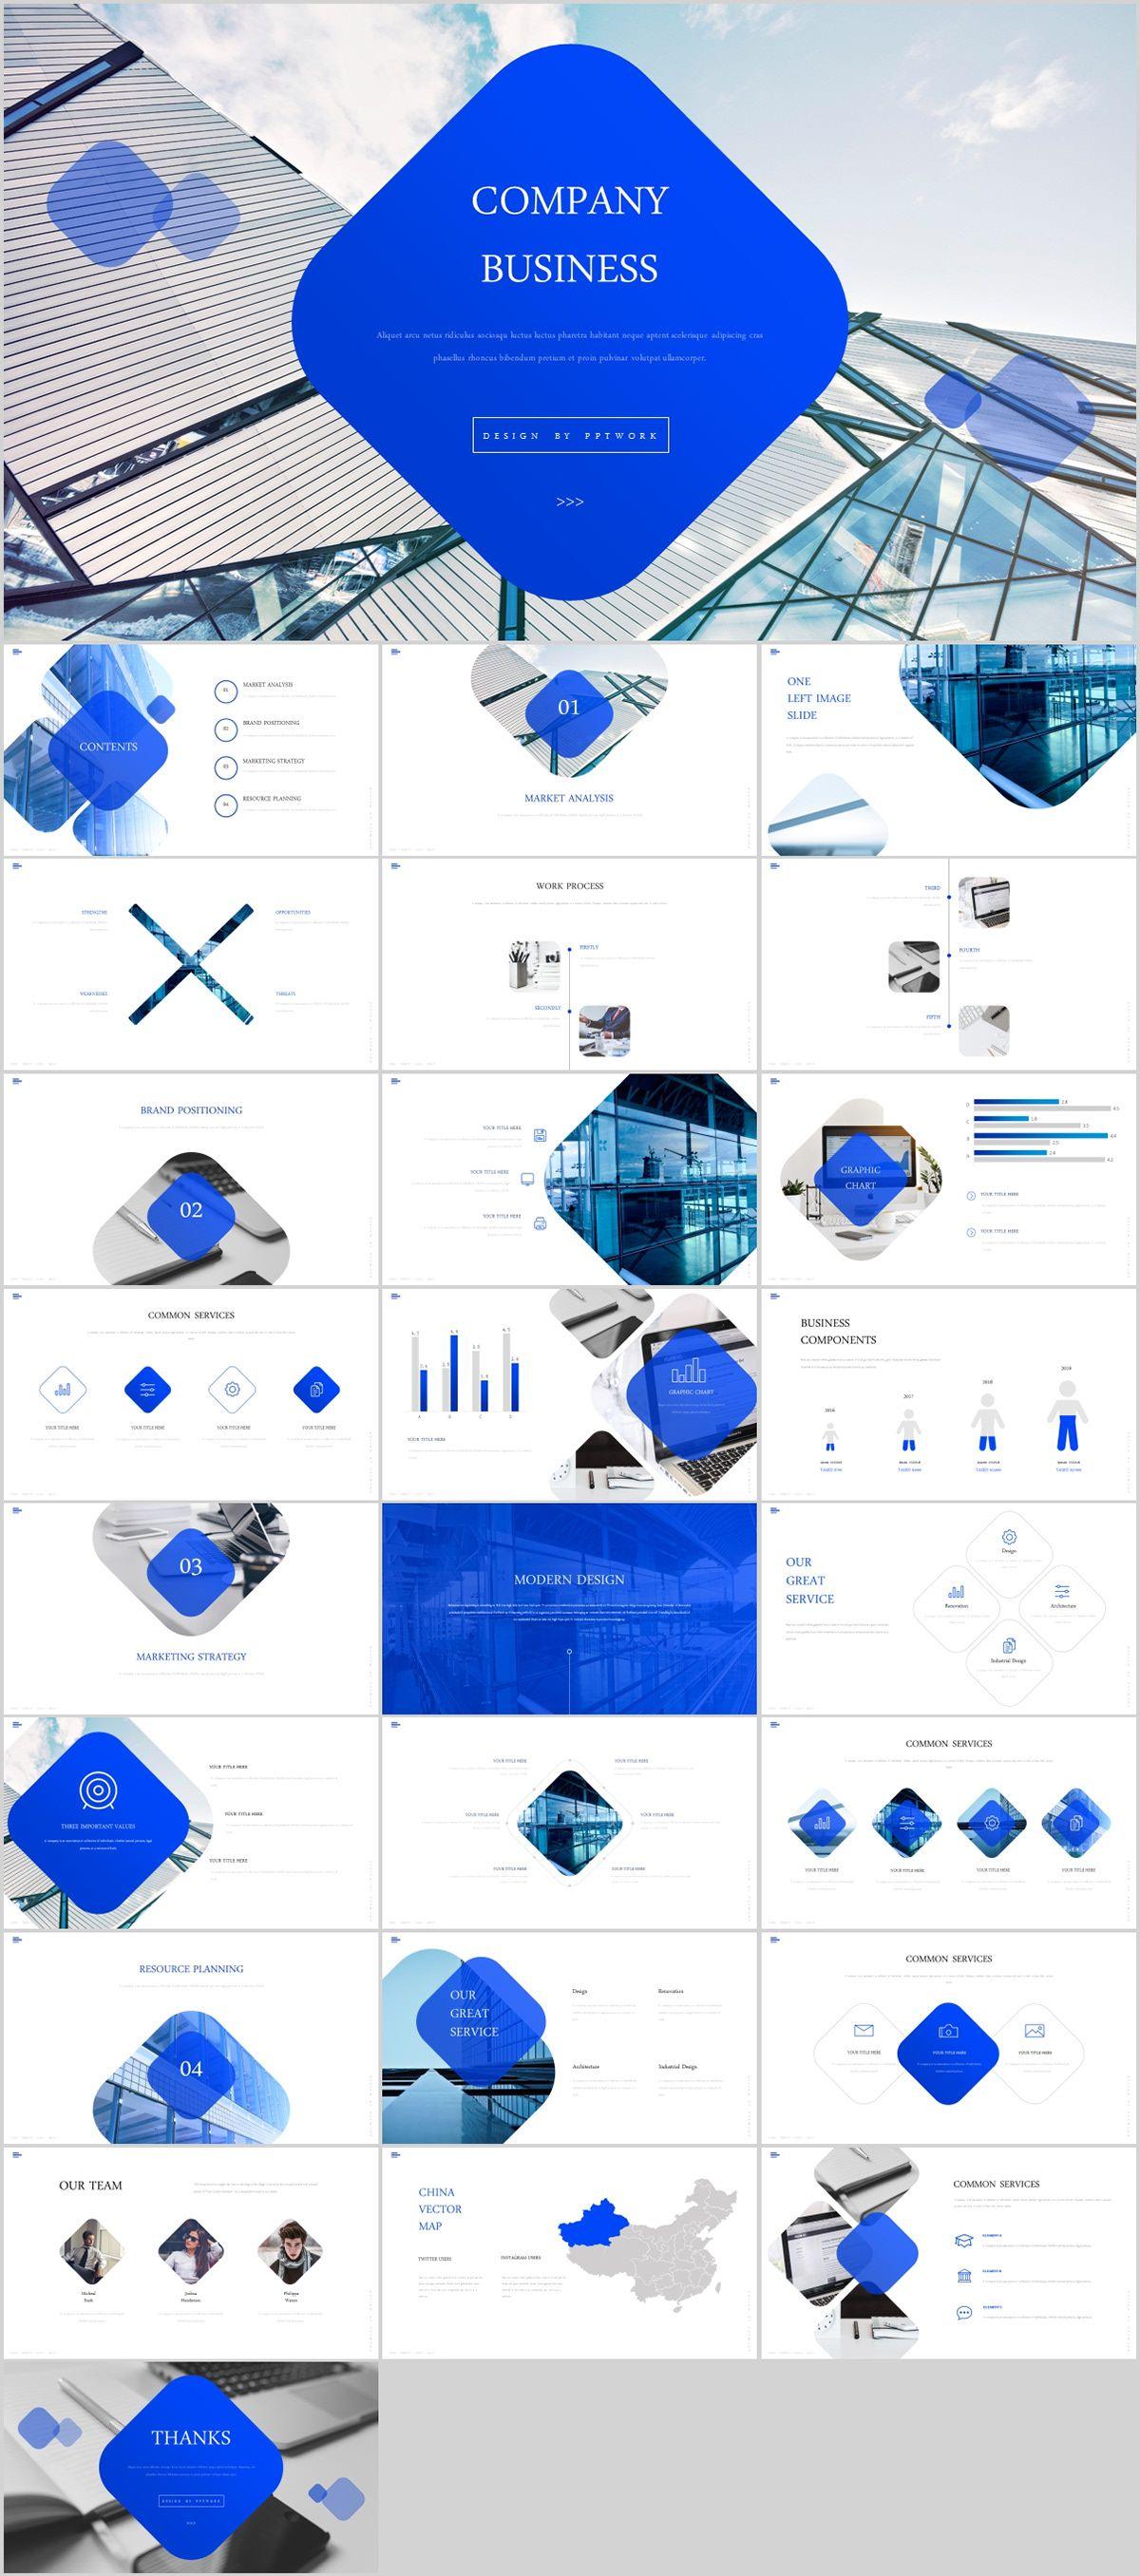 Blue company business powerpoint template on behance powerpoint blue company business powerpoint template on behance powerpoint templates presentation animation toneelgroepblik Images